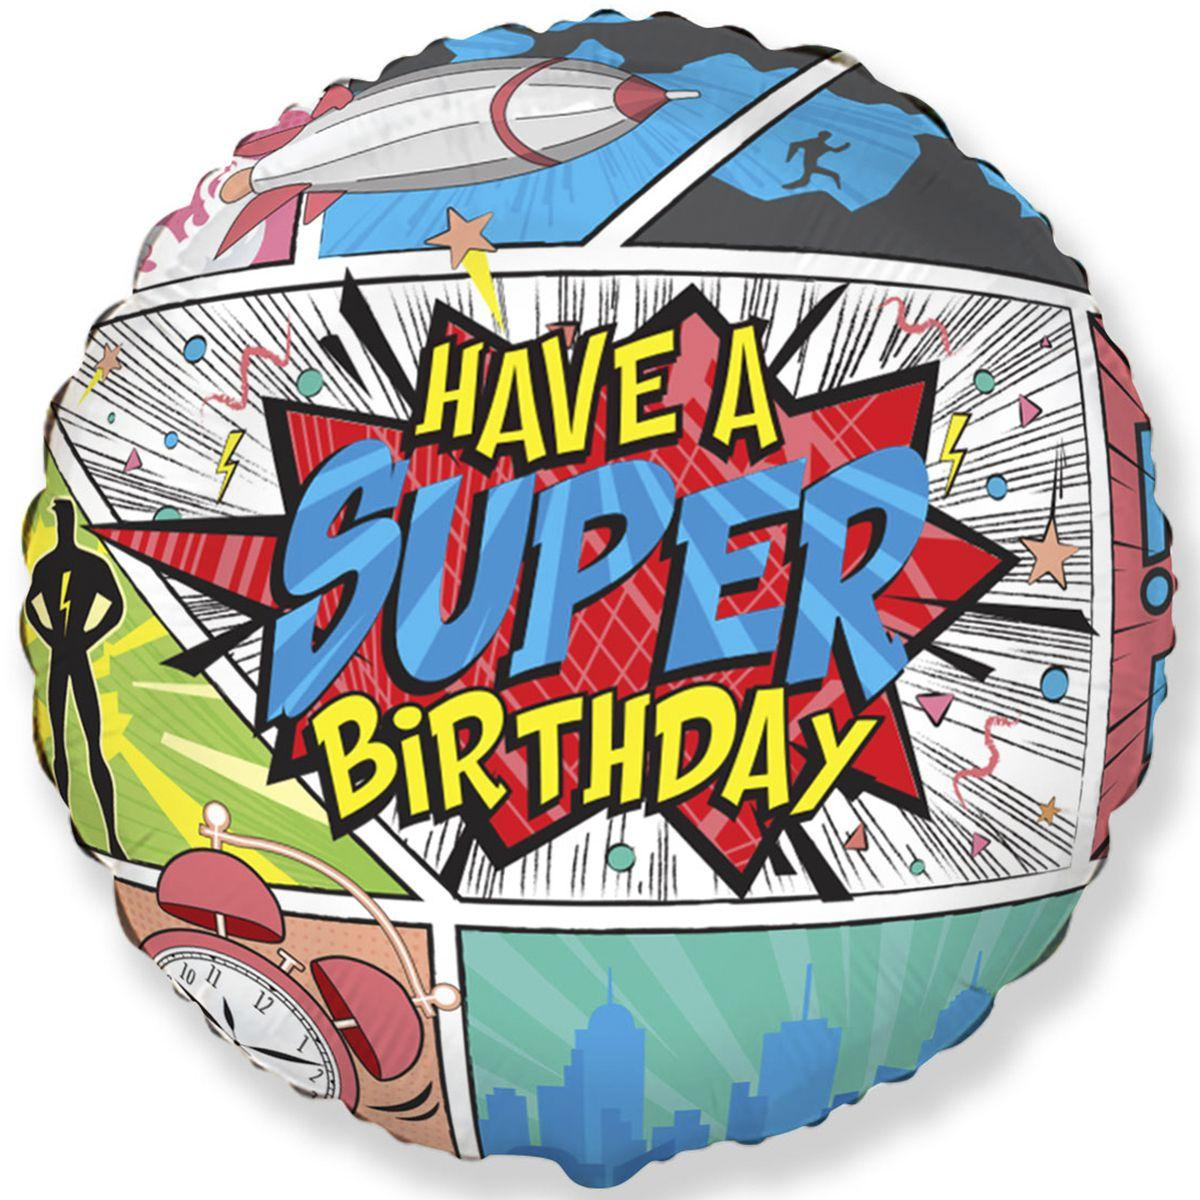 "Фол куля Flexmetal 18"" Коло HAVE A SUPER BIRTHDAY / Супер свято (ФМ)"